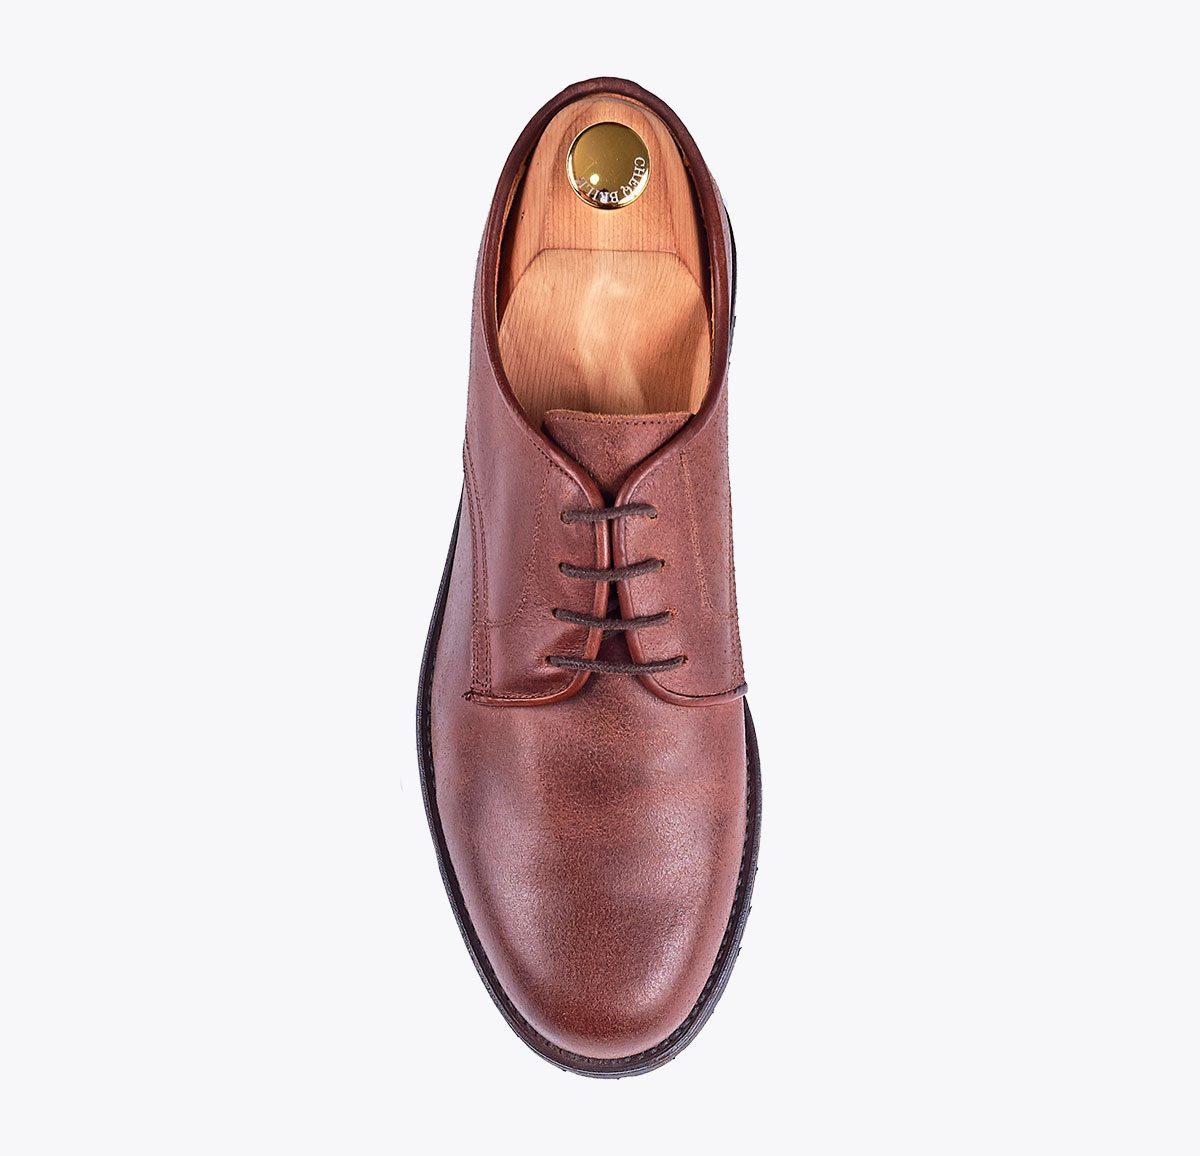 Zapato Campero hecho a mano en mandalashoes, Santanyí Mallorca. Hand made shoes. Nach Mass Schuhe